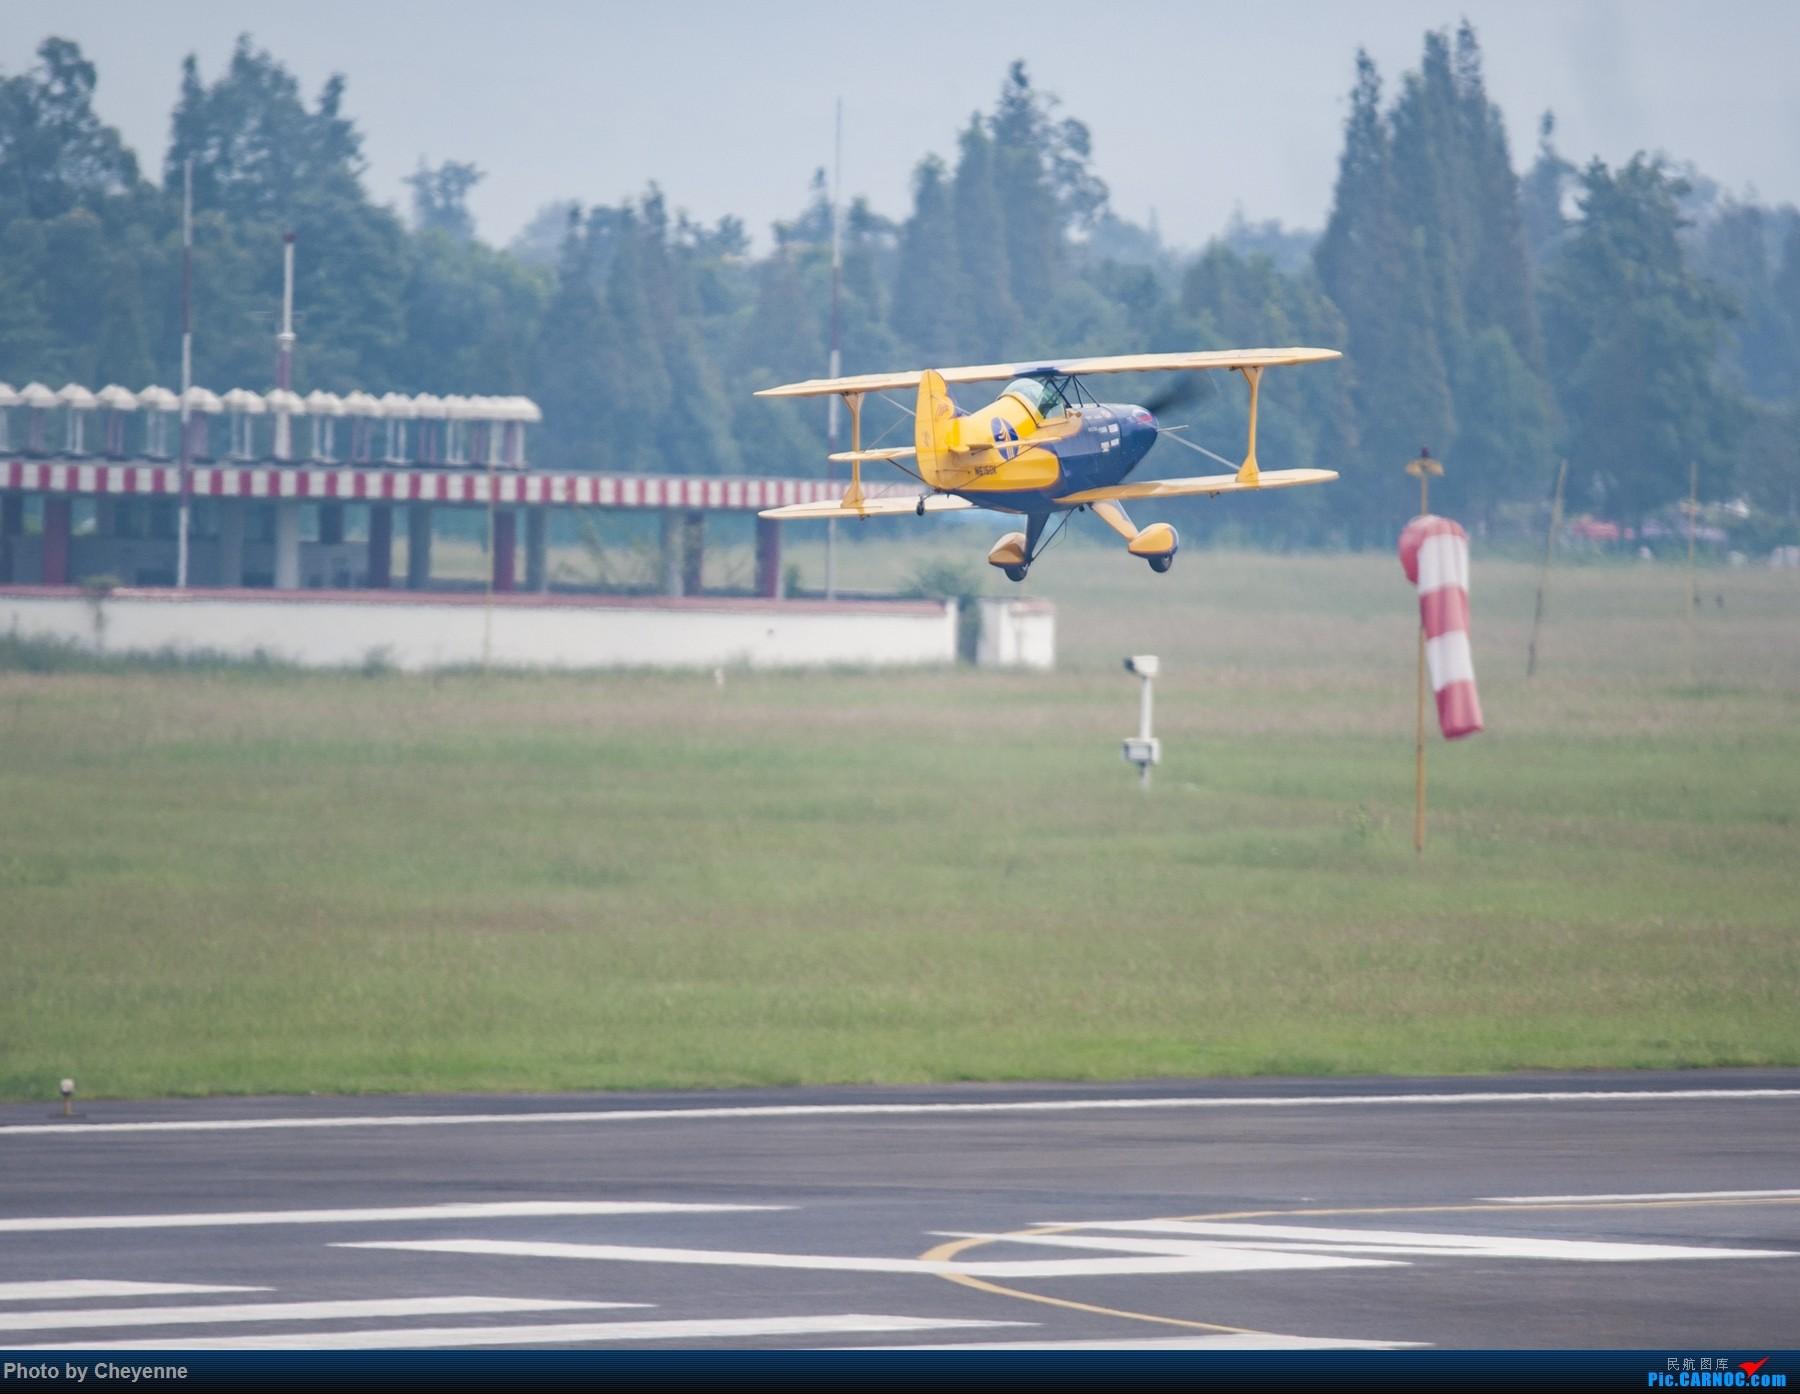 Re:[原创]外面遛遛就好,瞅瞅可爱的华约小蜜蜂 PITTS S-1S SPECIAL N615DK 中国广汉机场